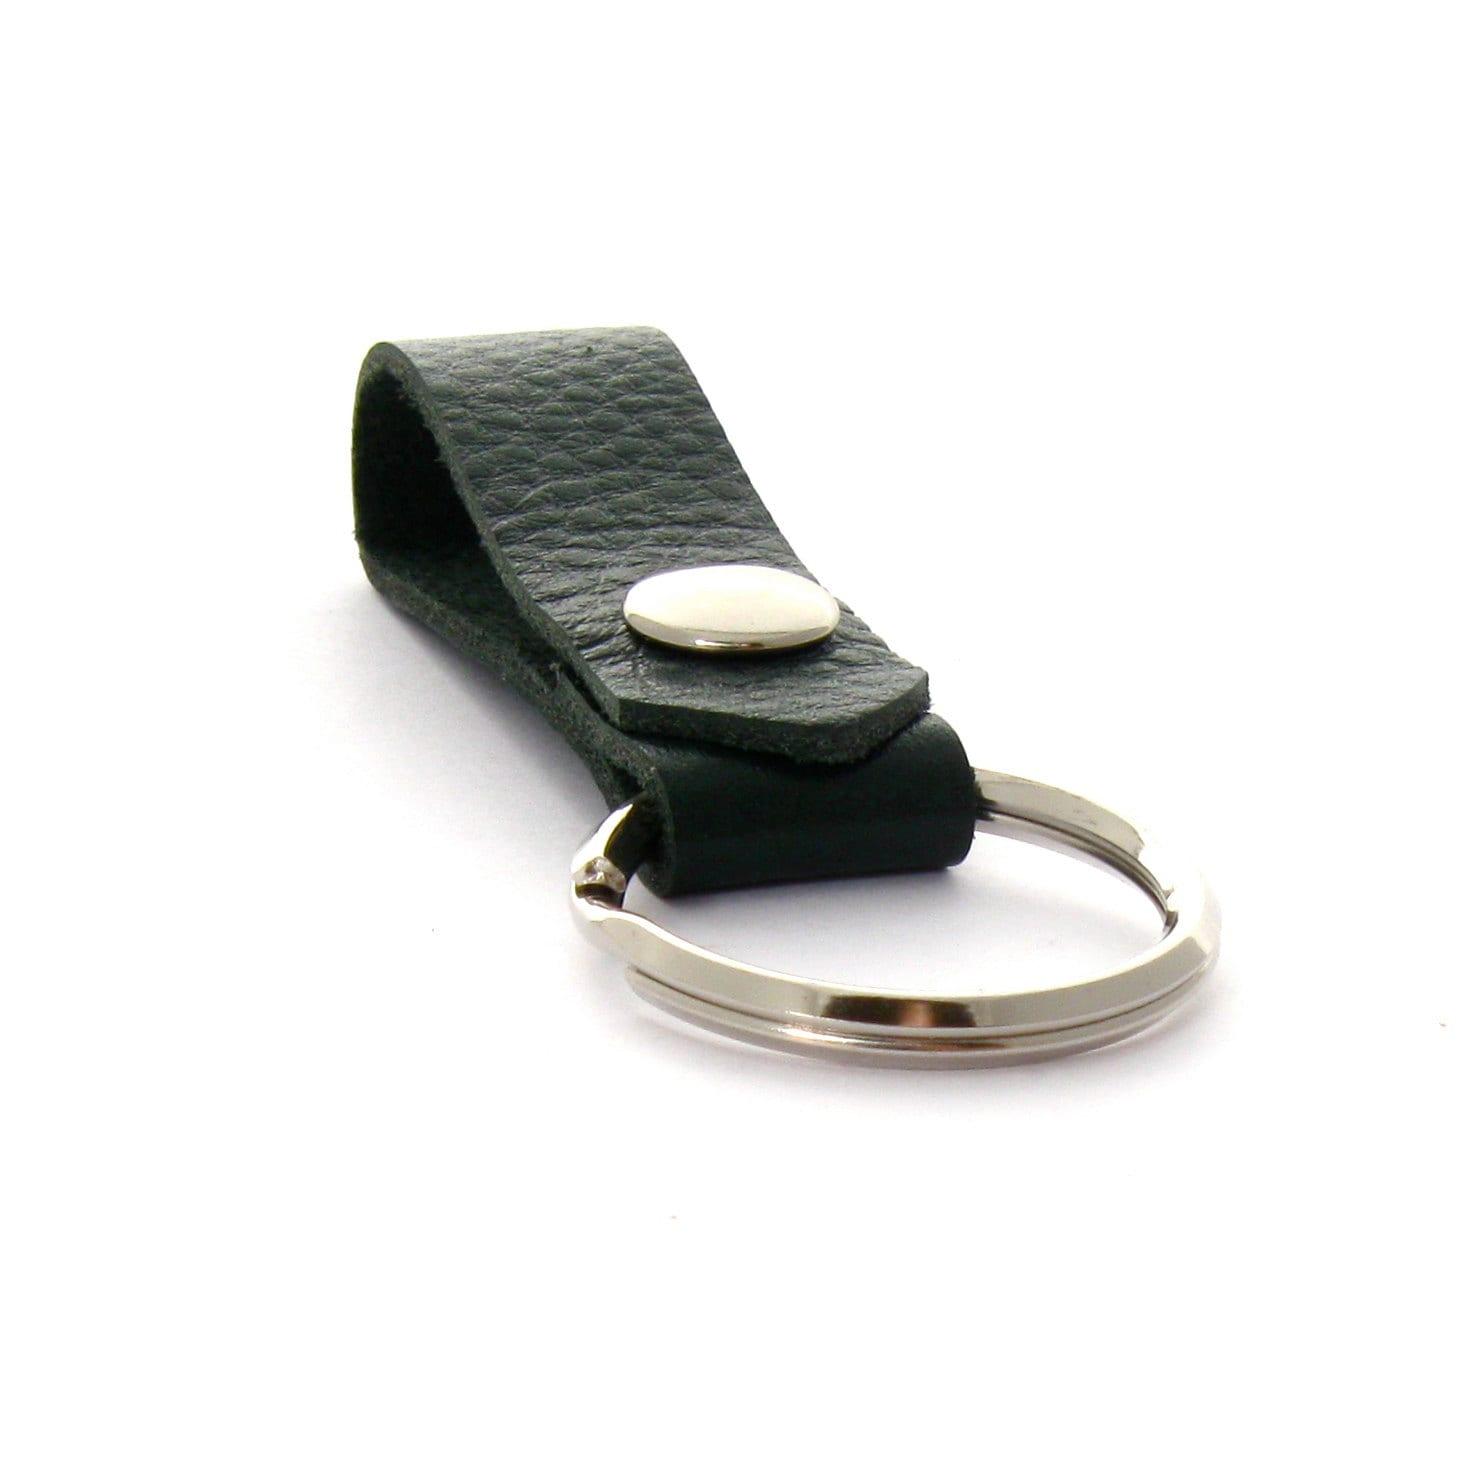 Forest Green Men S Leather Key Fob Leather Belt Loop Key